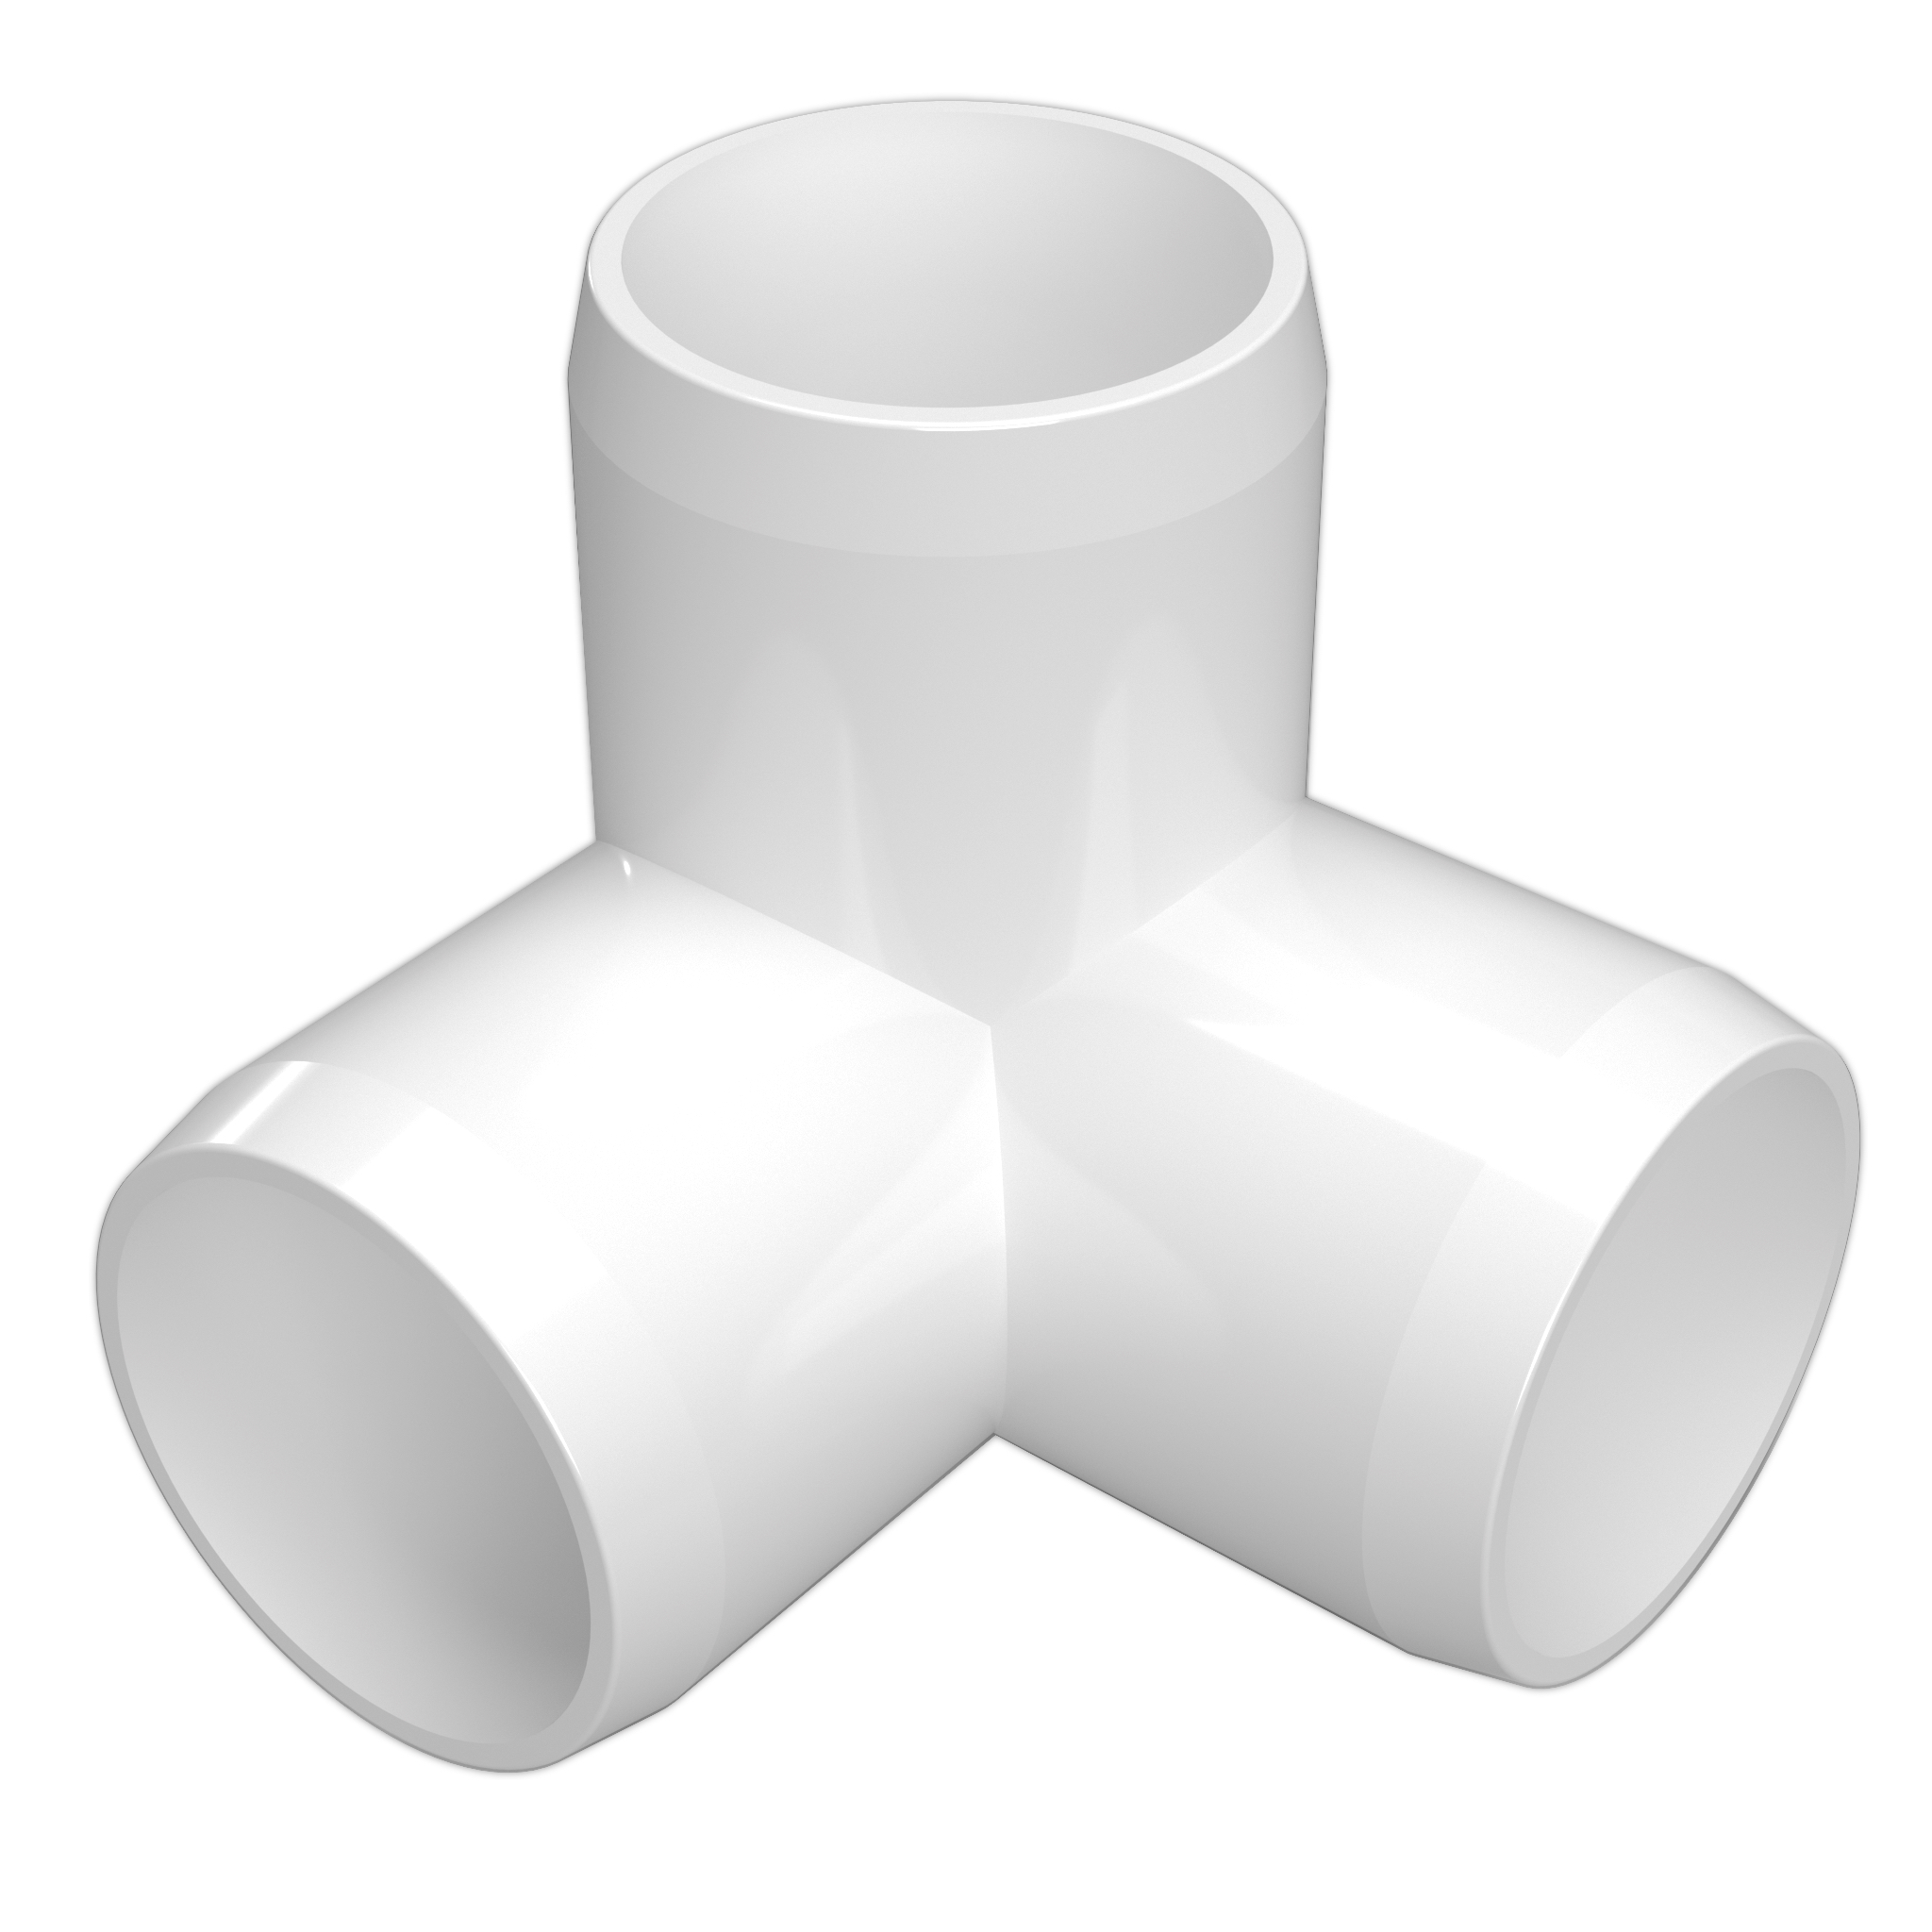 Formufit F1143we Wh 4 3 Way Elbow Pvc Ing Furniture Grade 1 Size White Pack